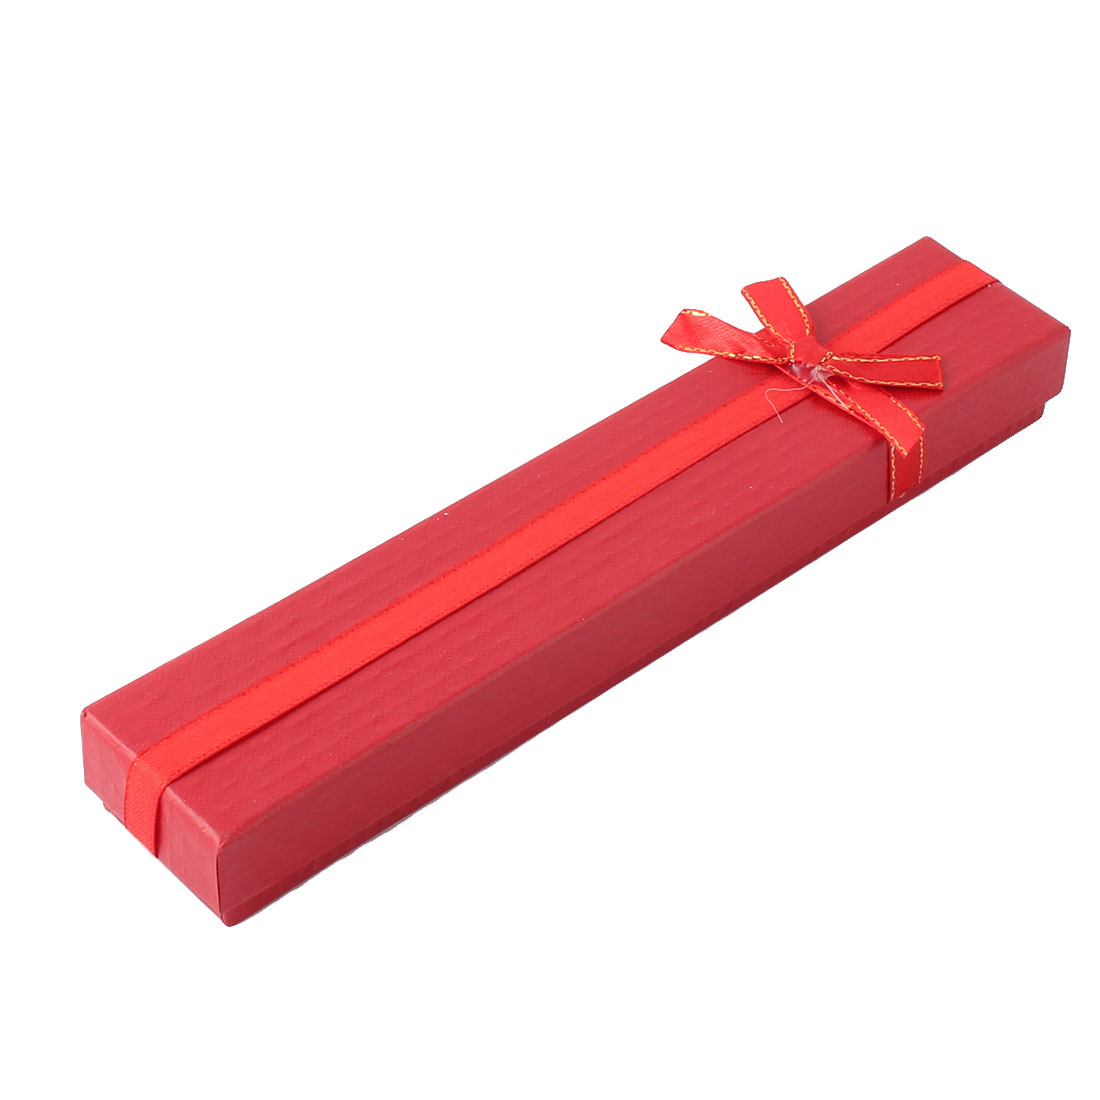 Unique Bargains Cardboard Rectangle Shape Bowknot Decor Choker Necklace Bracelet Gift Box Red